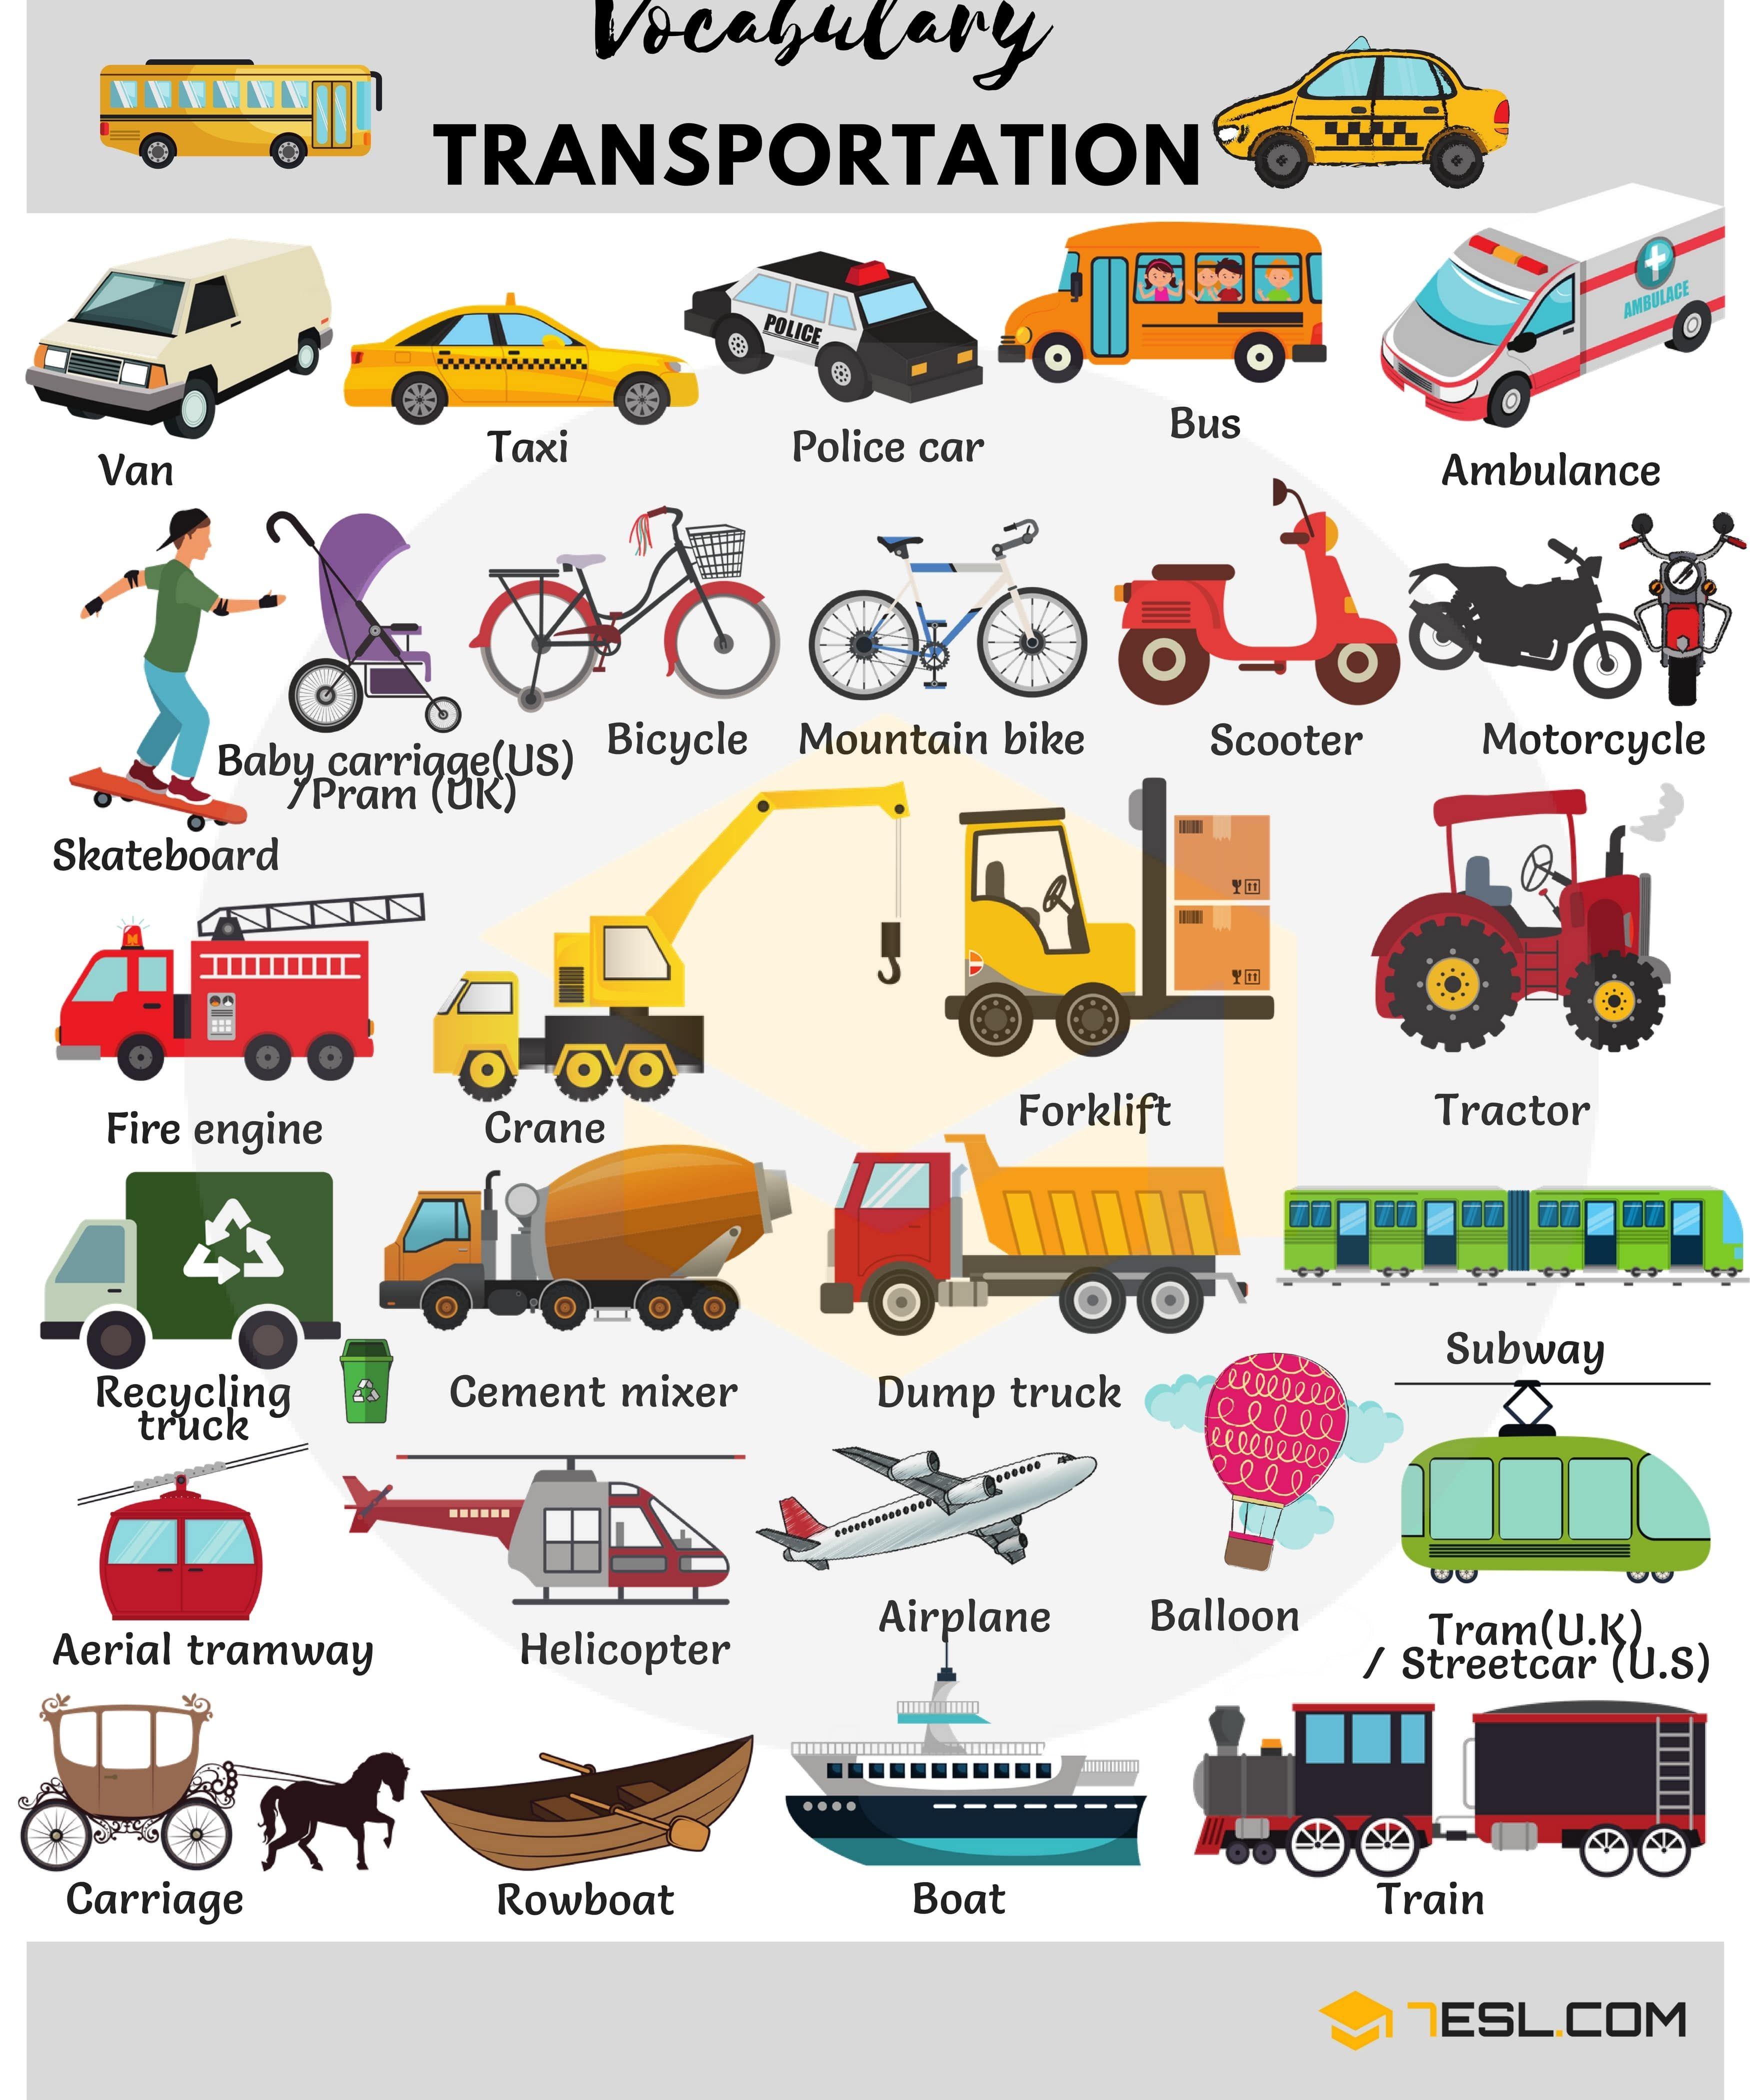 mon Vehicles Vocabulary